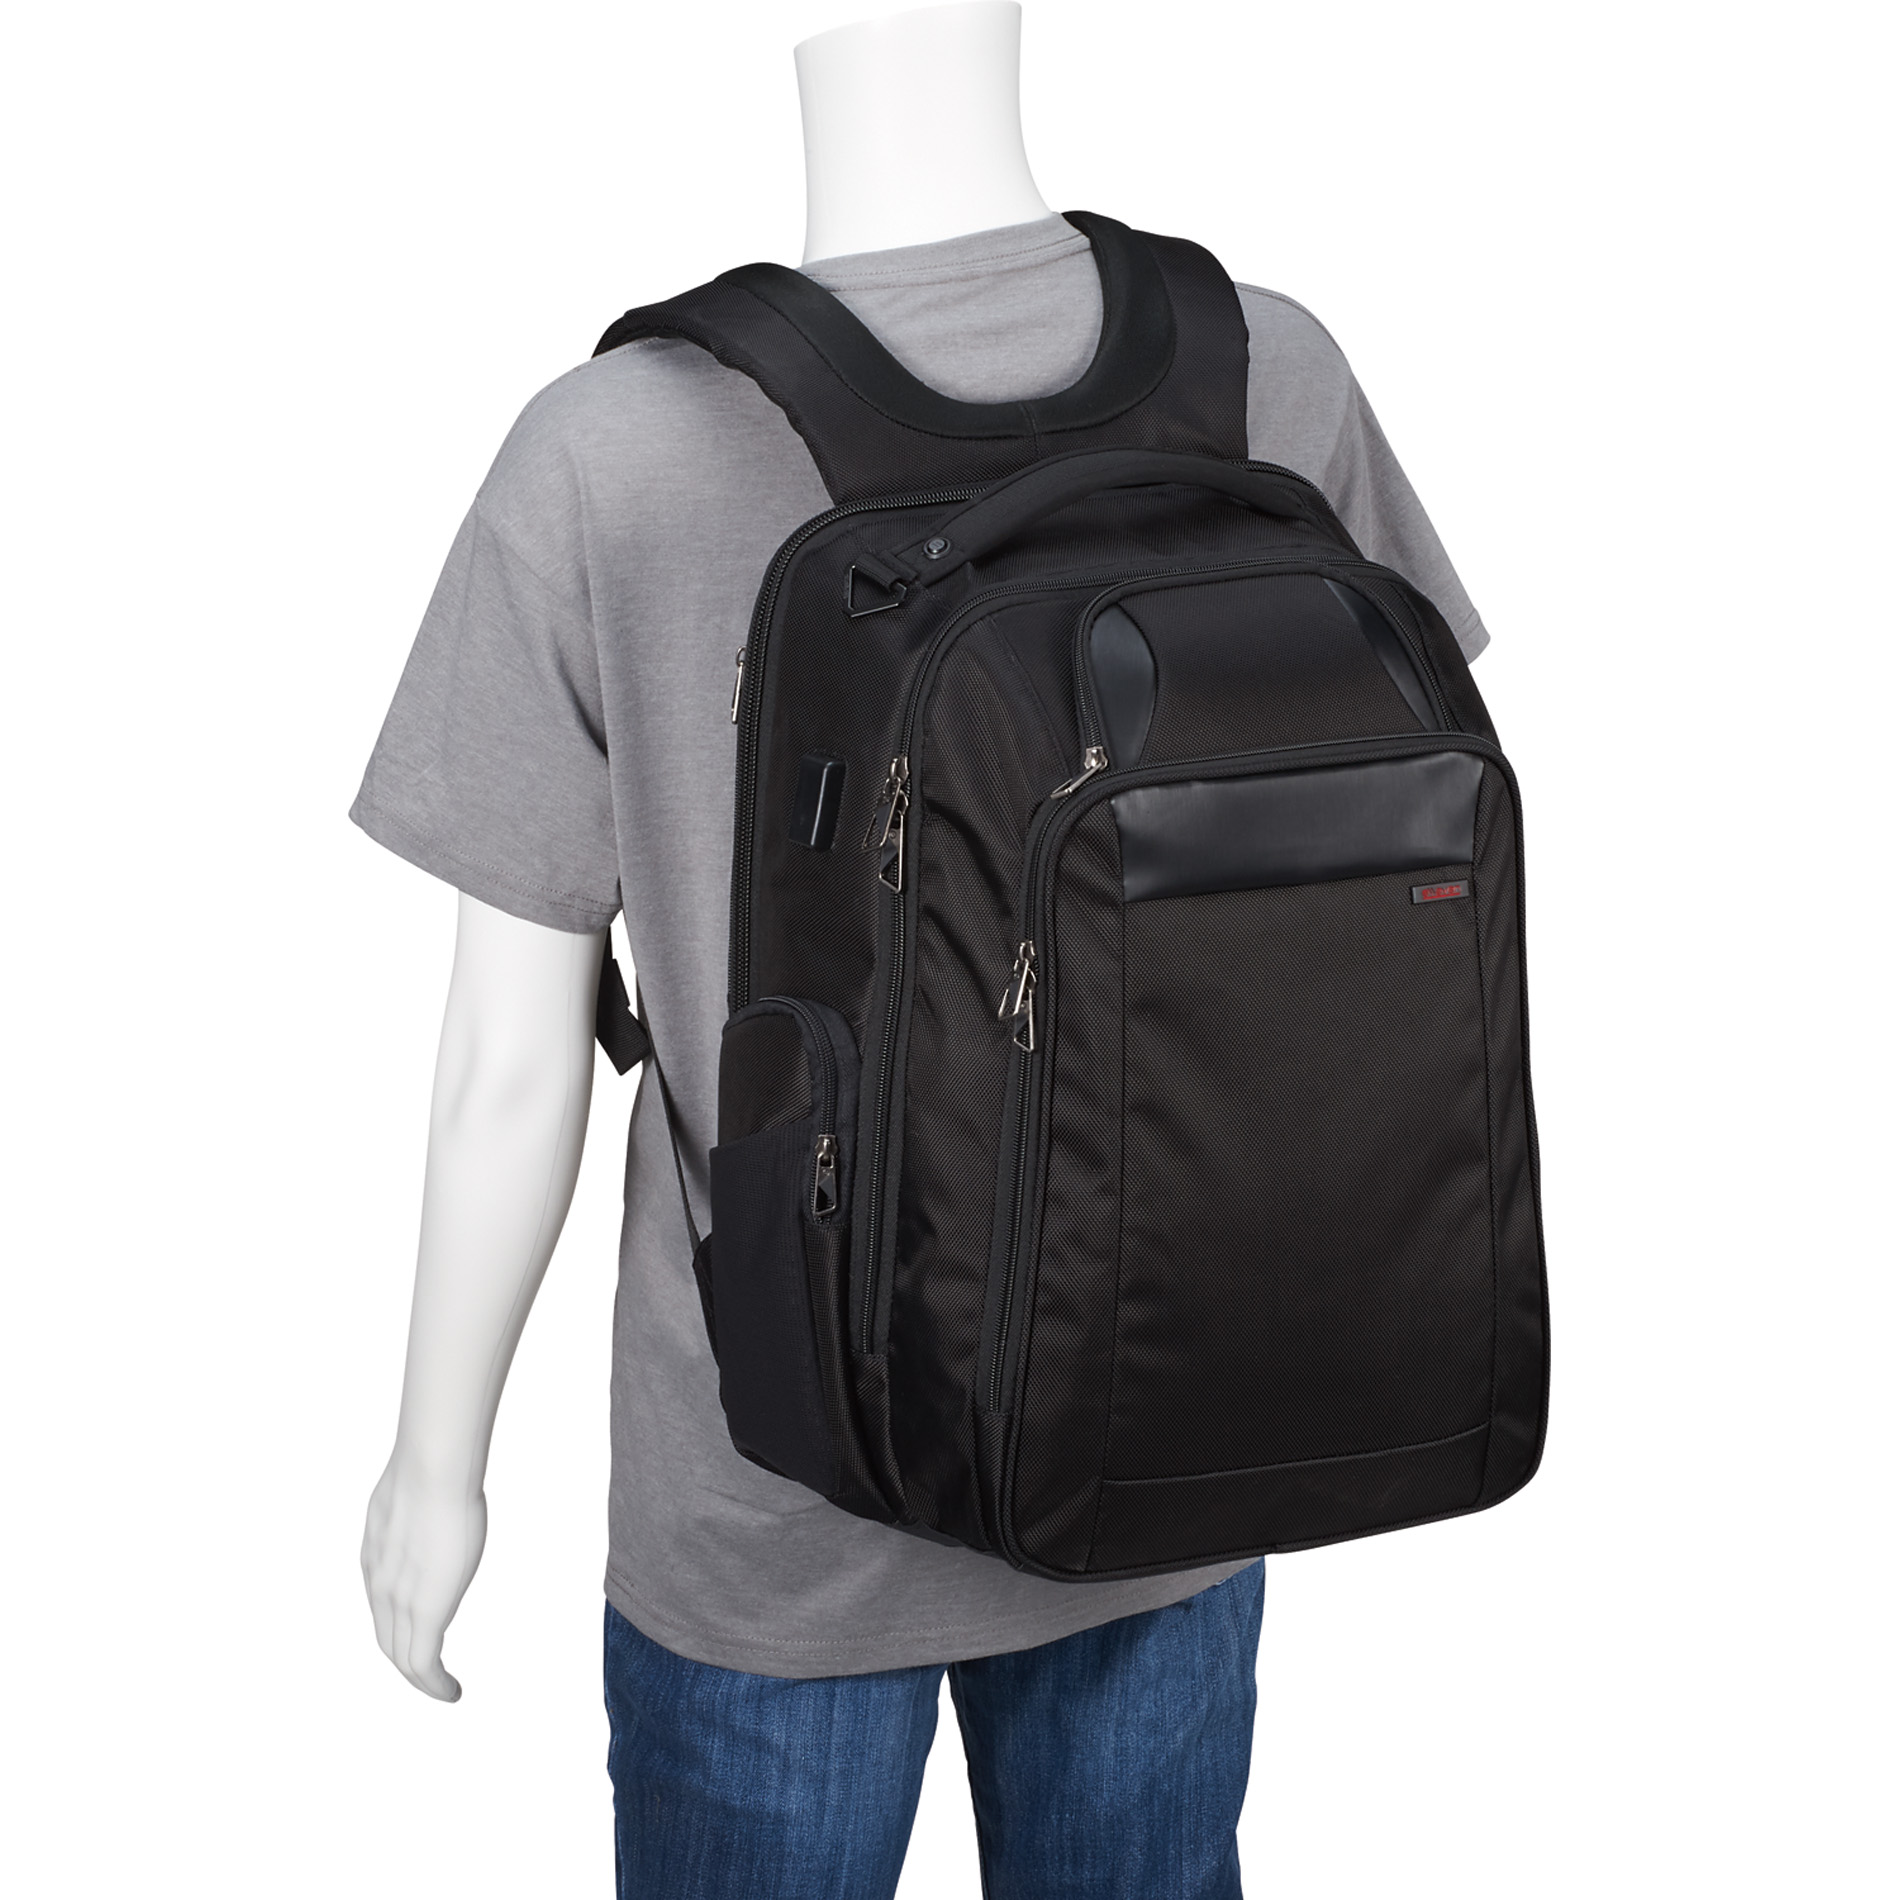 "elleven? Stow TSA 17"" Computer Backpack"